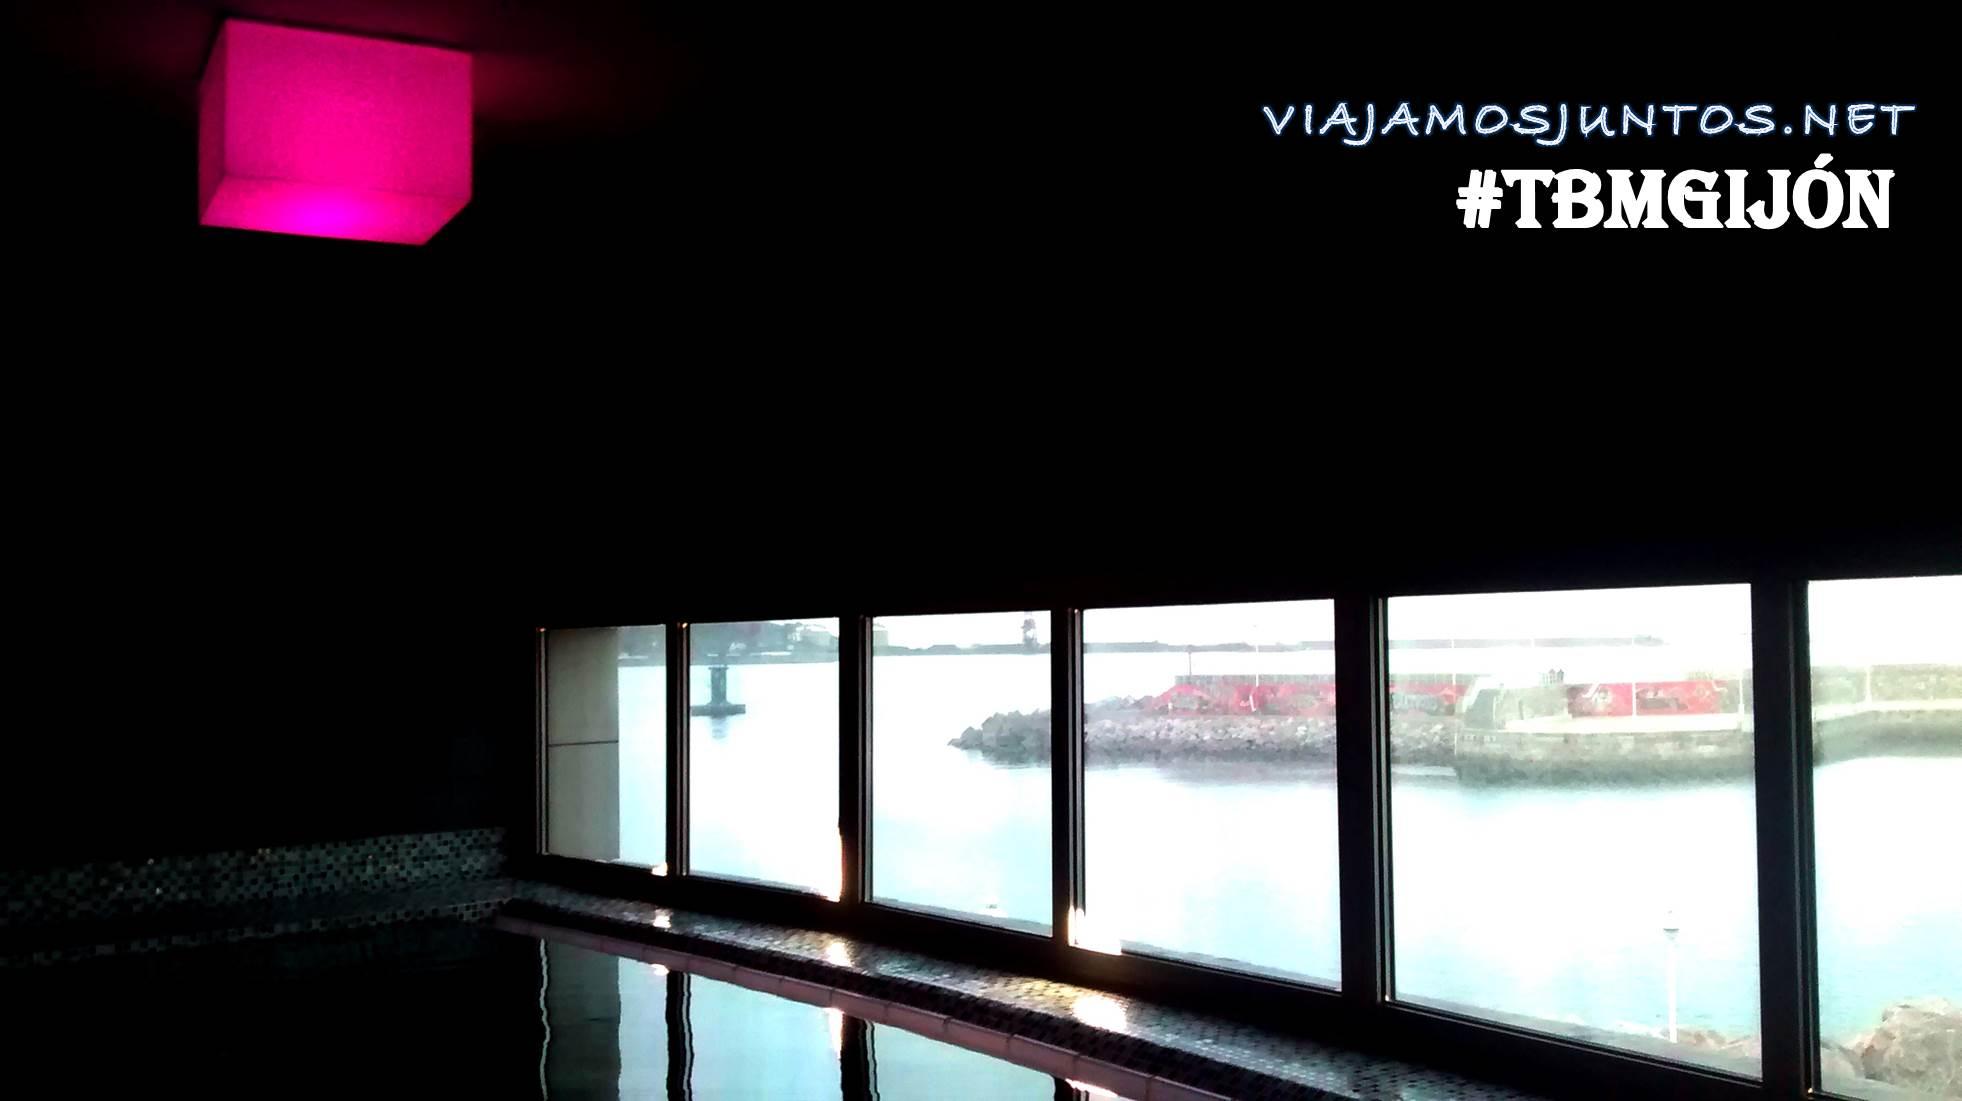 Gijón, Asturias, TBM, TBMGijón, bloggers, travel bloggers meeting, surf, talasoponiente, acuario, jardín botánico